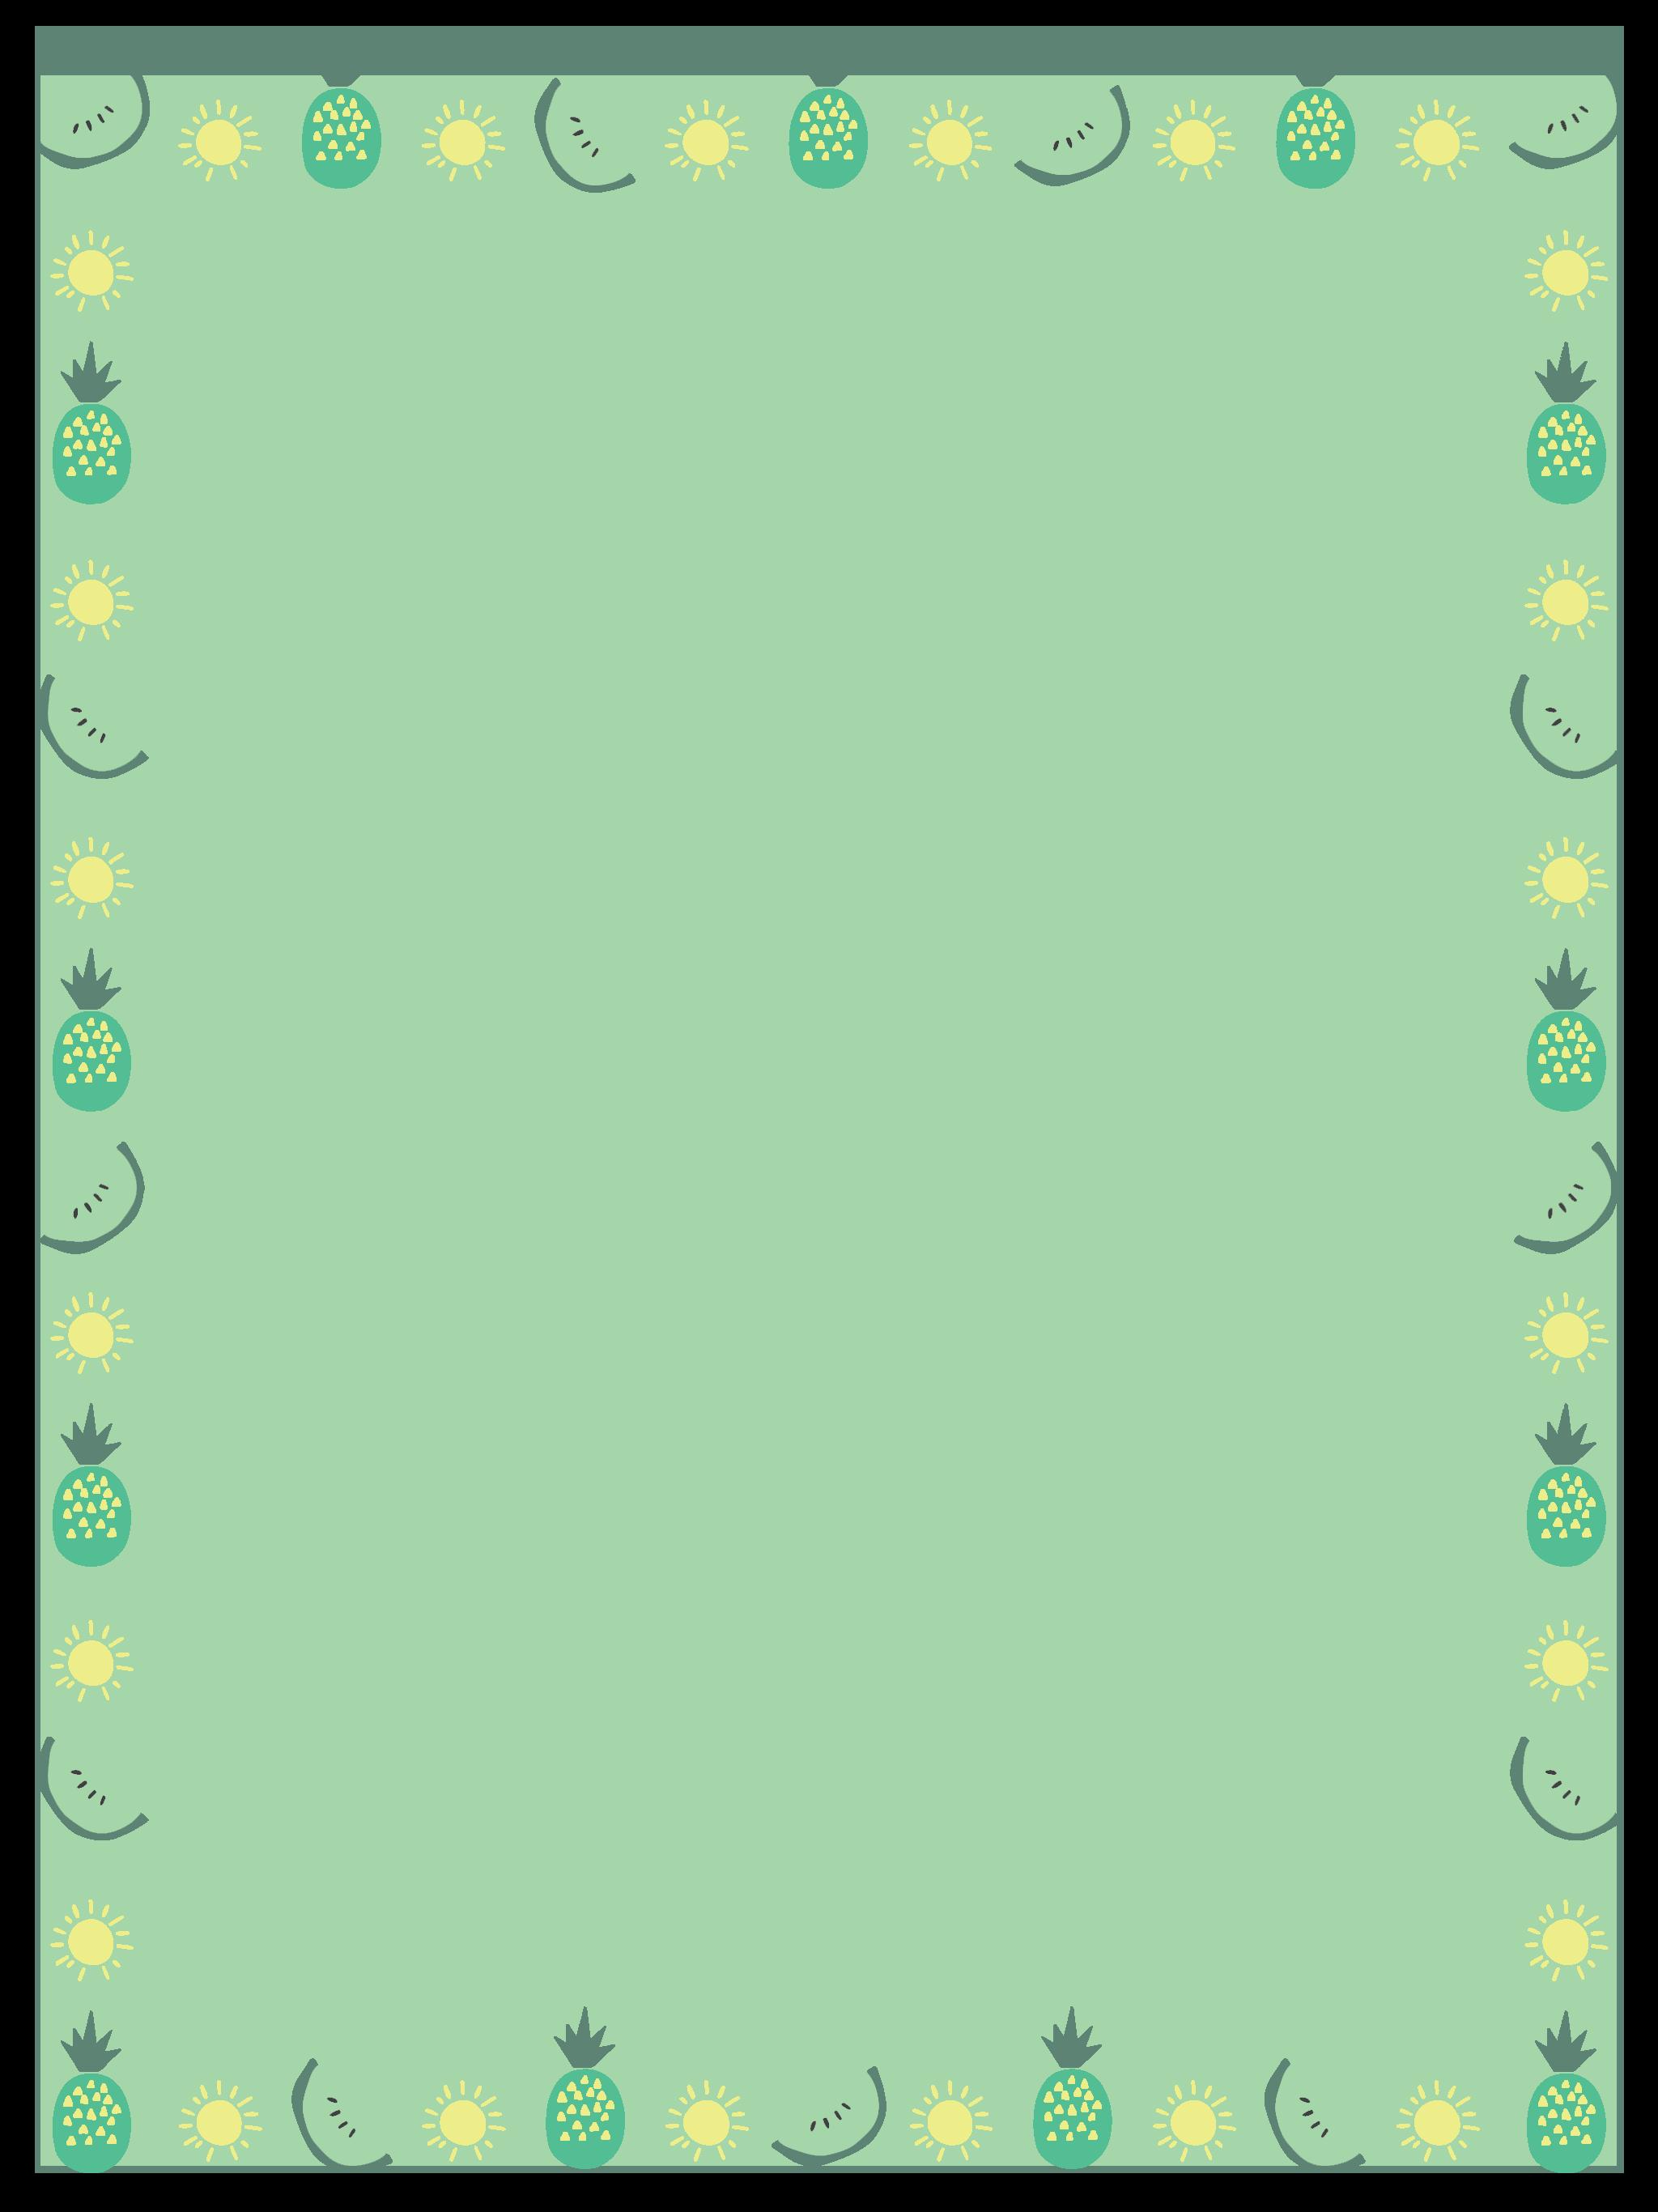 Ipad Vertical_2048x2732_Fruit_Green.png